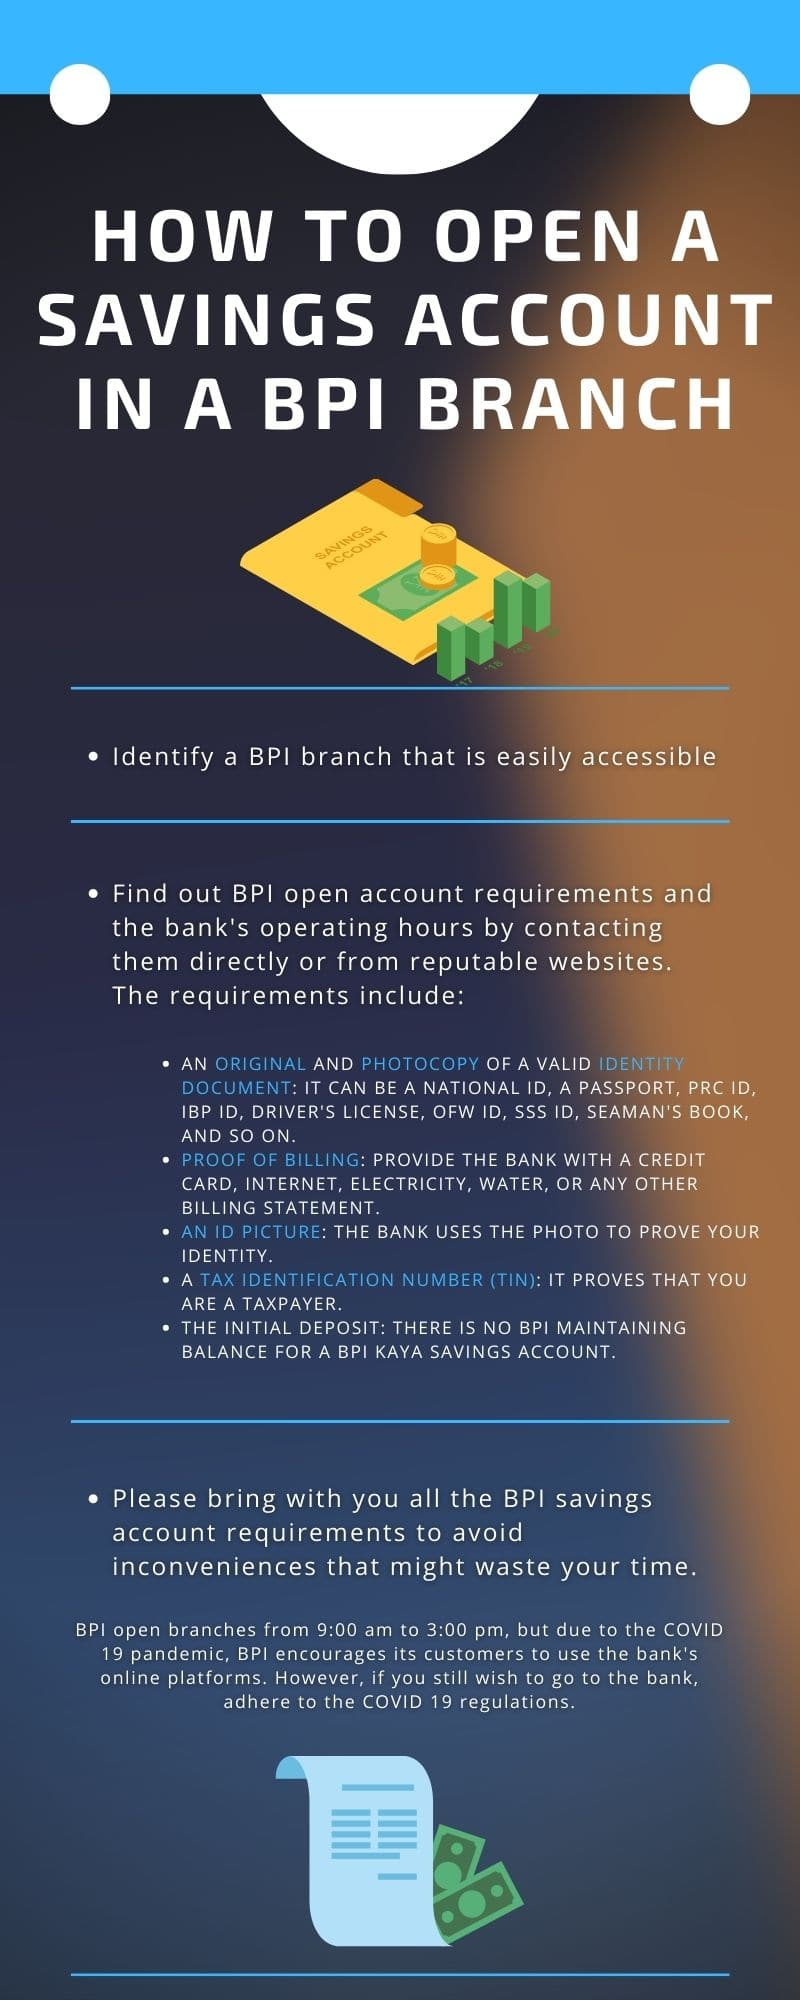 How to open BPI savings account